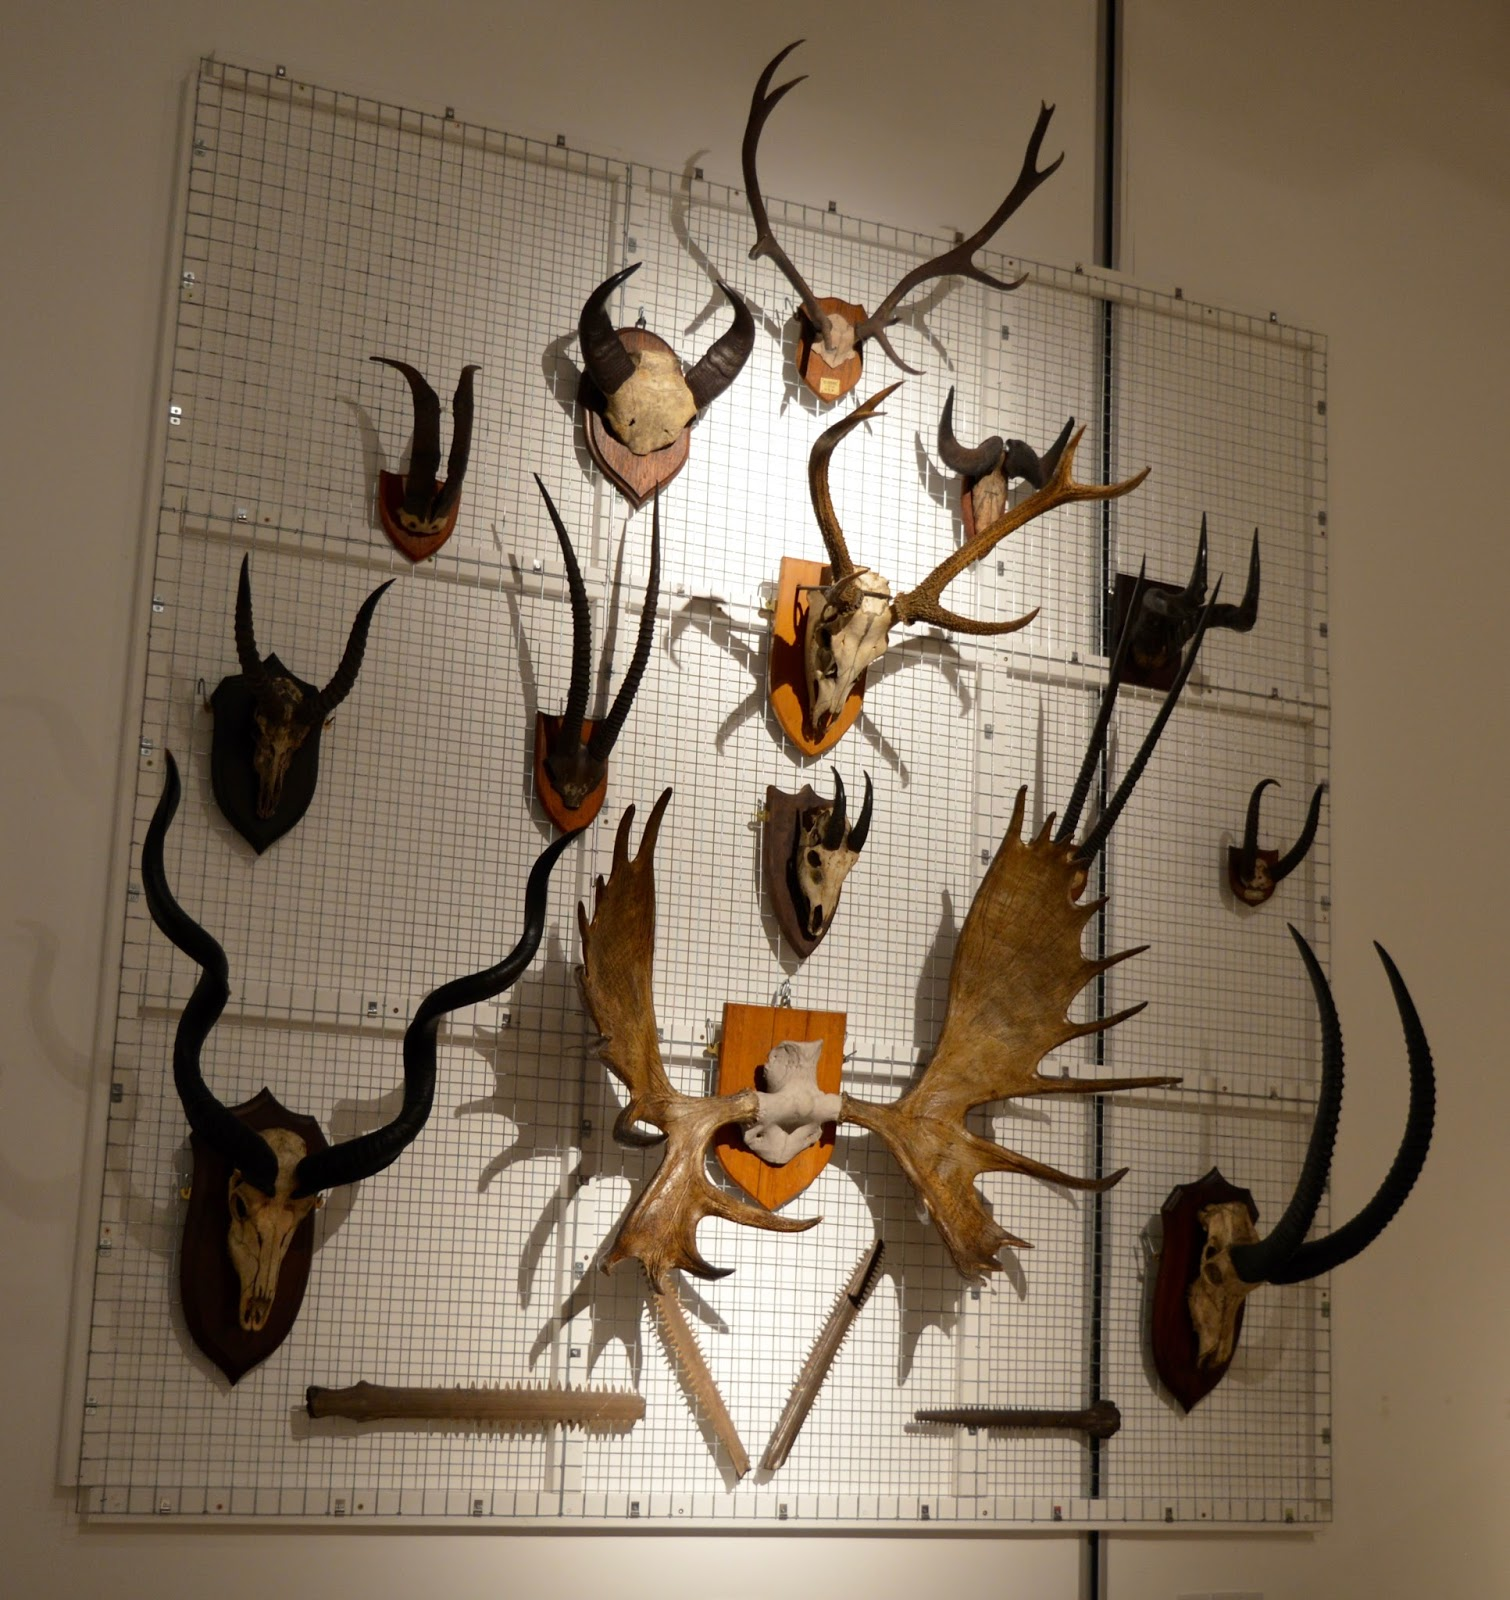 Bones Exhibition at Hancock Museum, Newcastle - wall of antlers